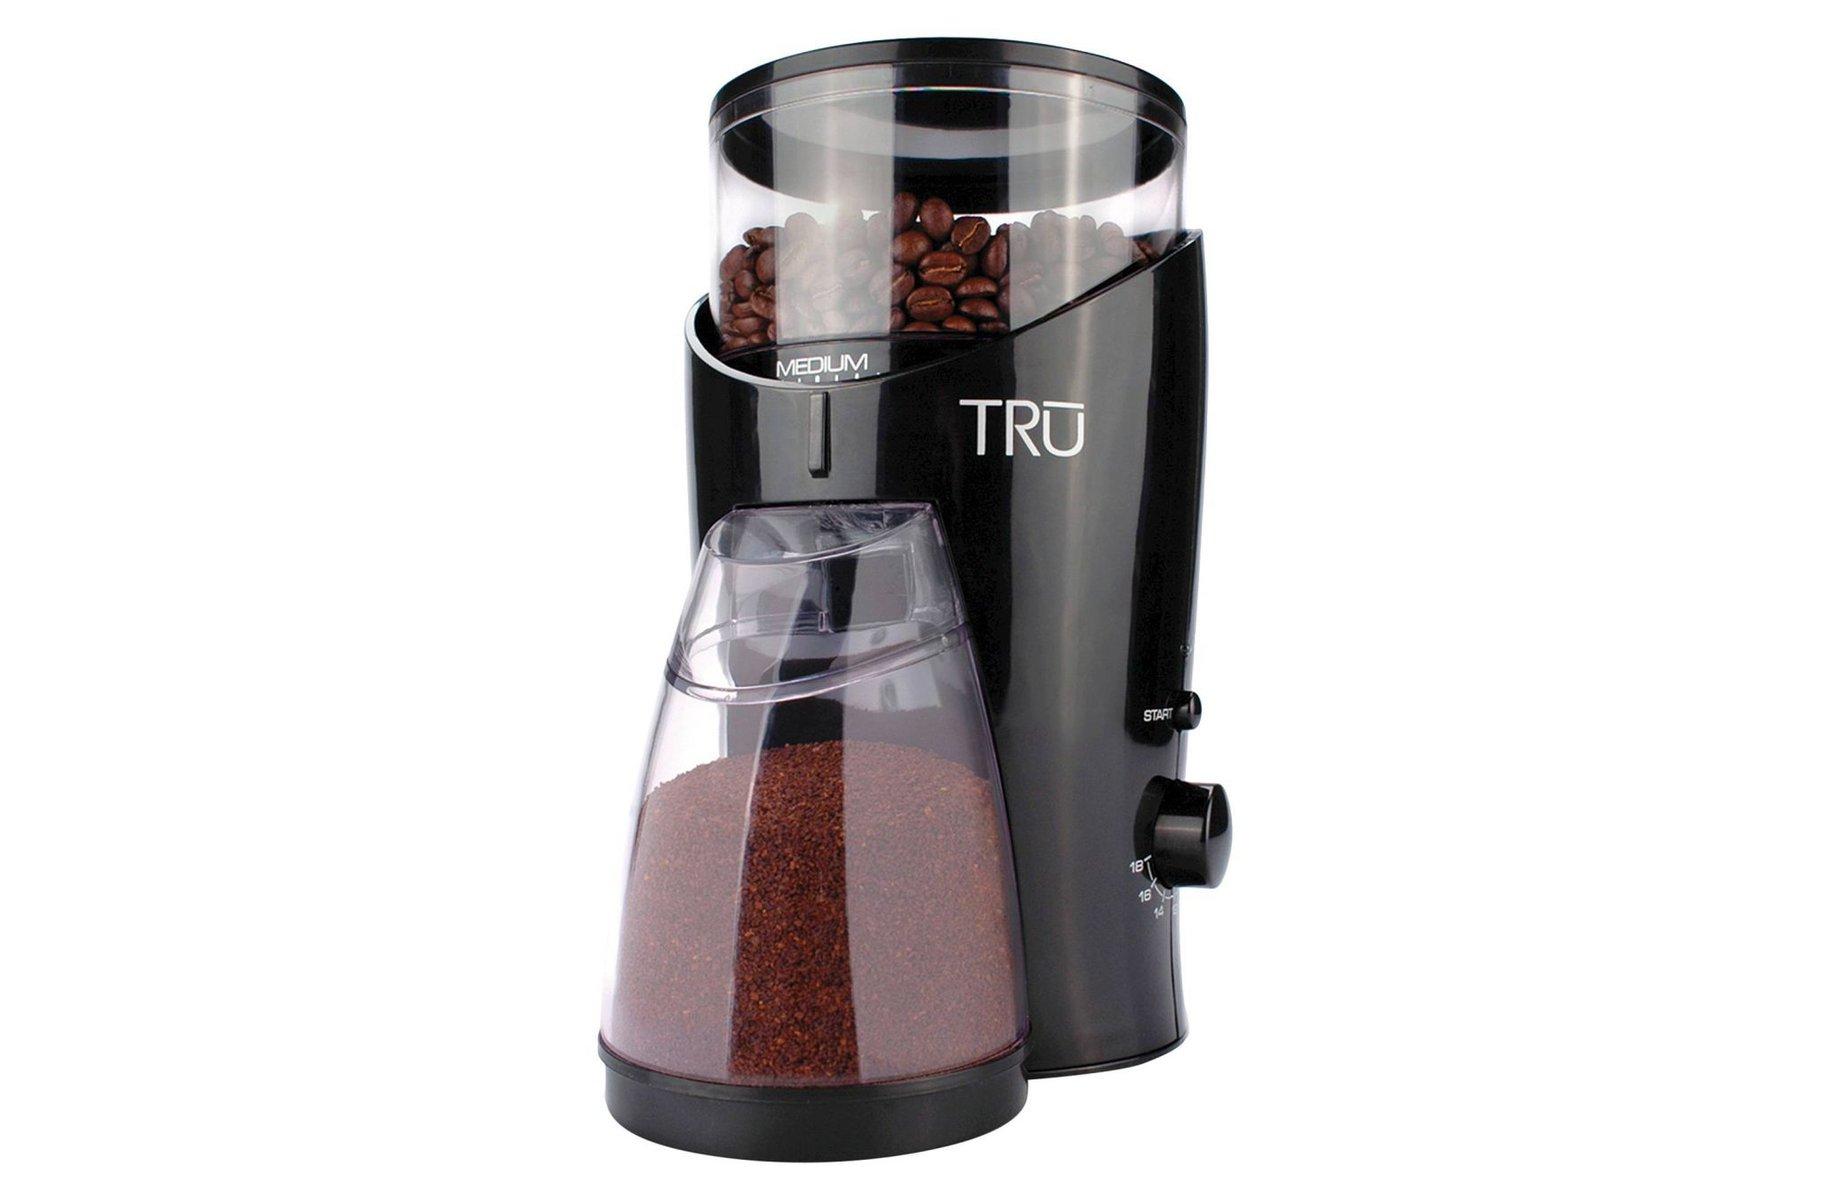 Italian Coffee Maker Grind Size : Italian Coffee Maker Target. Awards. Pour. 2 Cup Coffee Filter Machine. Venus Espresso Coffee ...